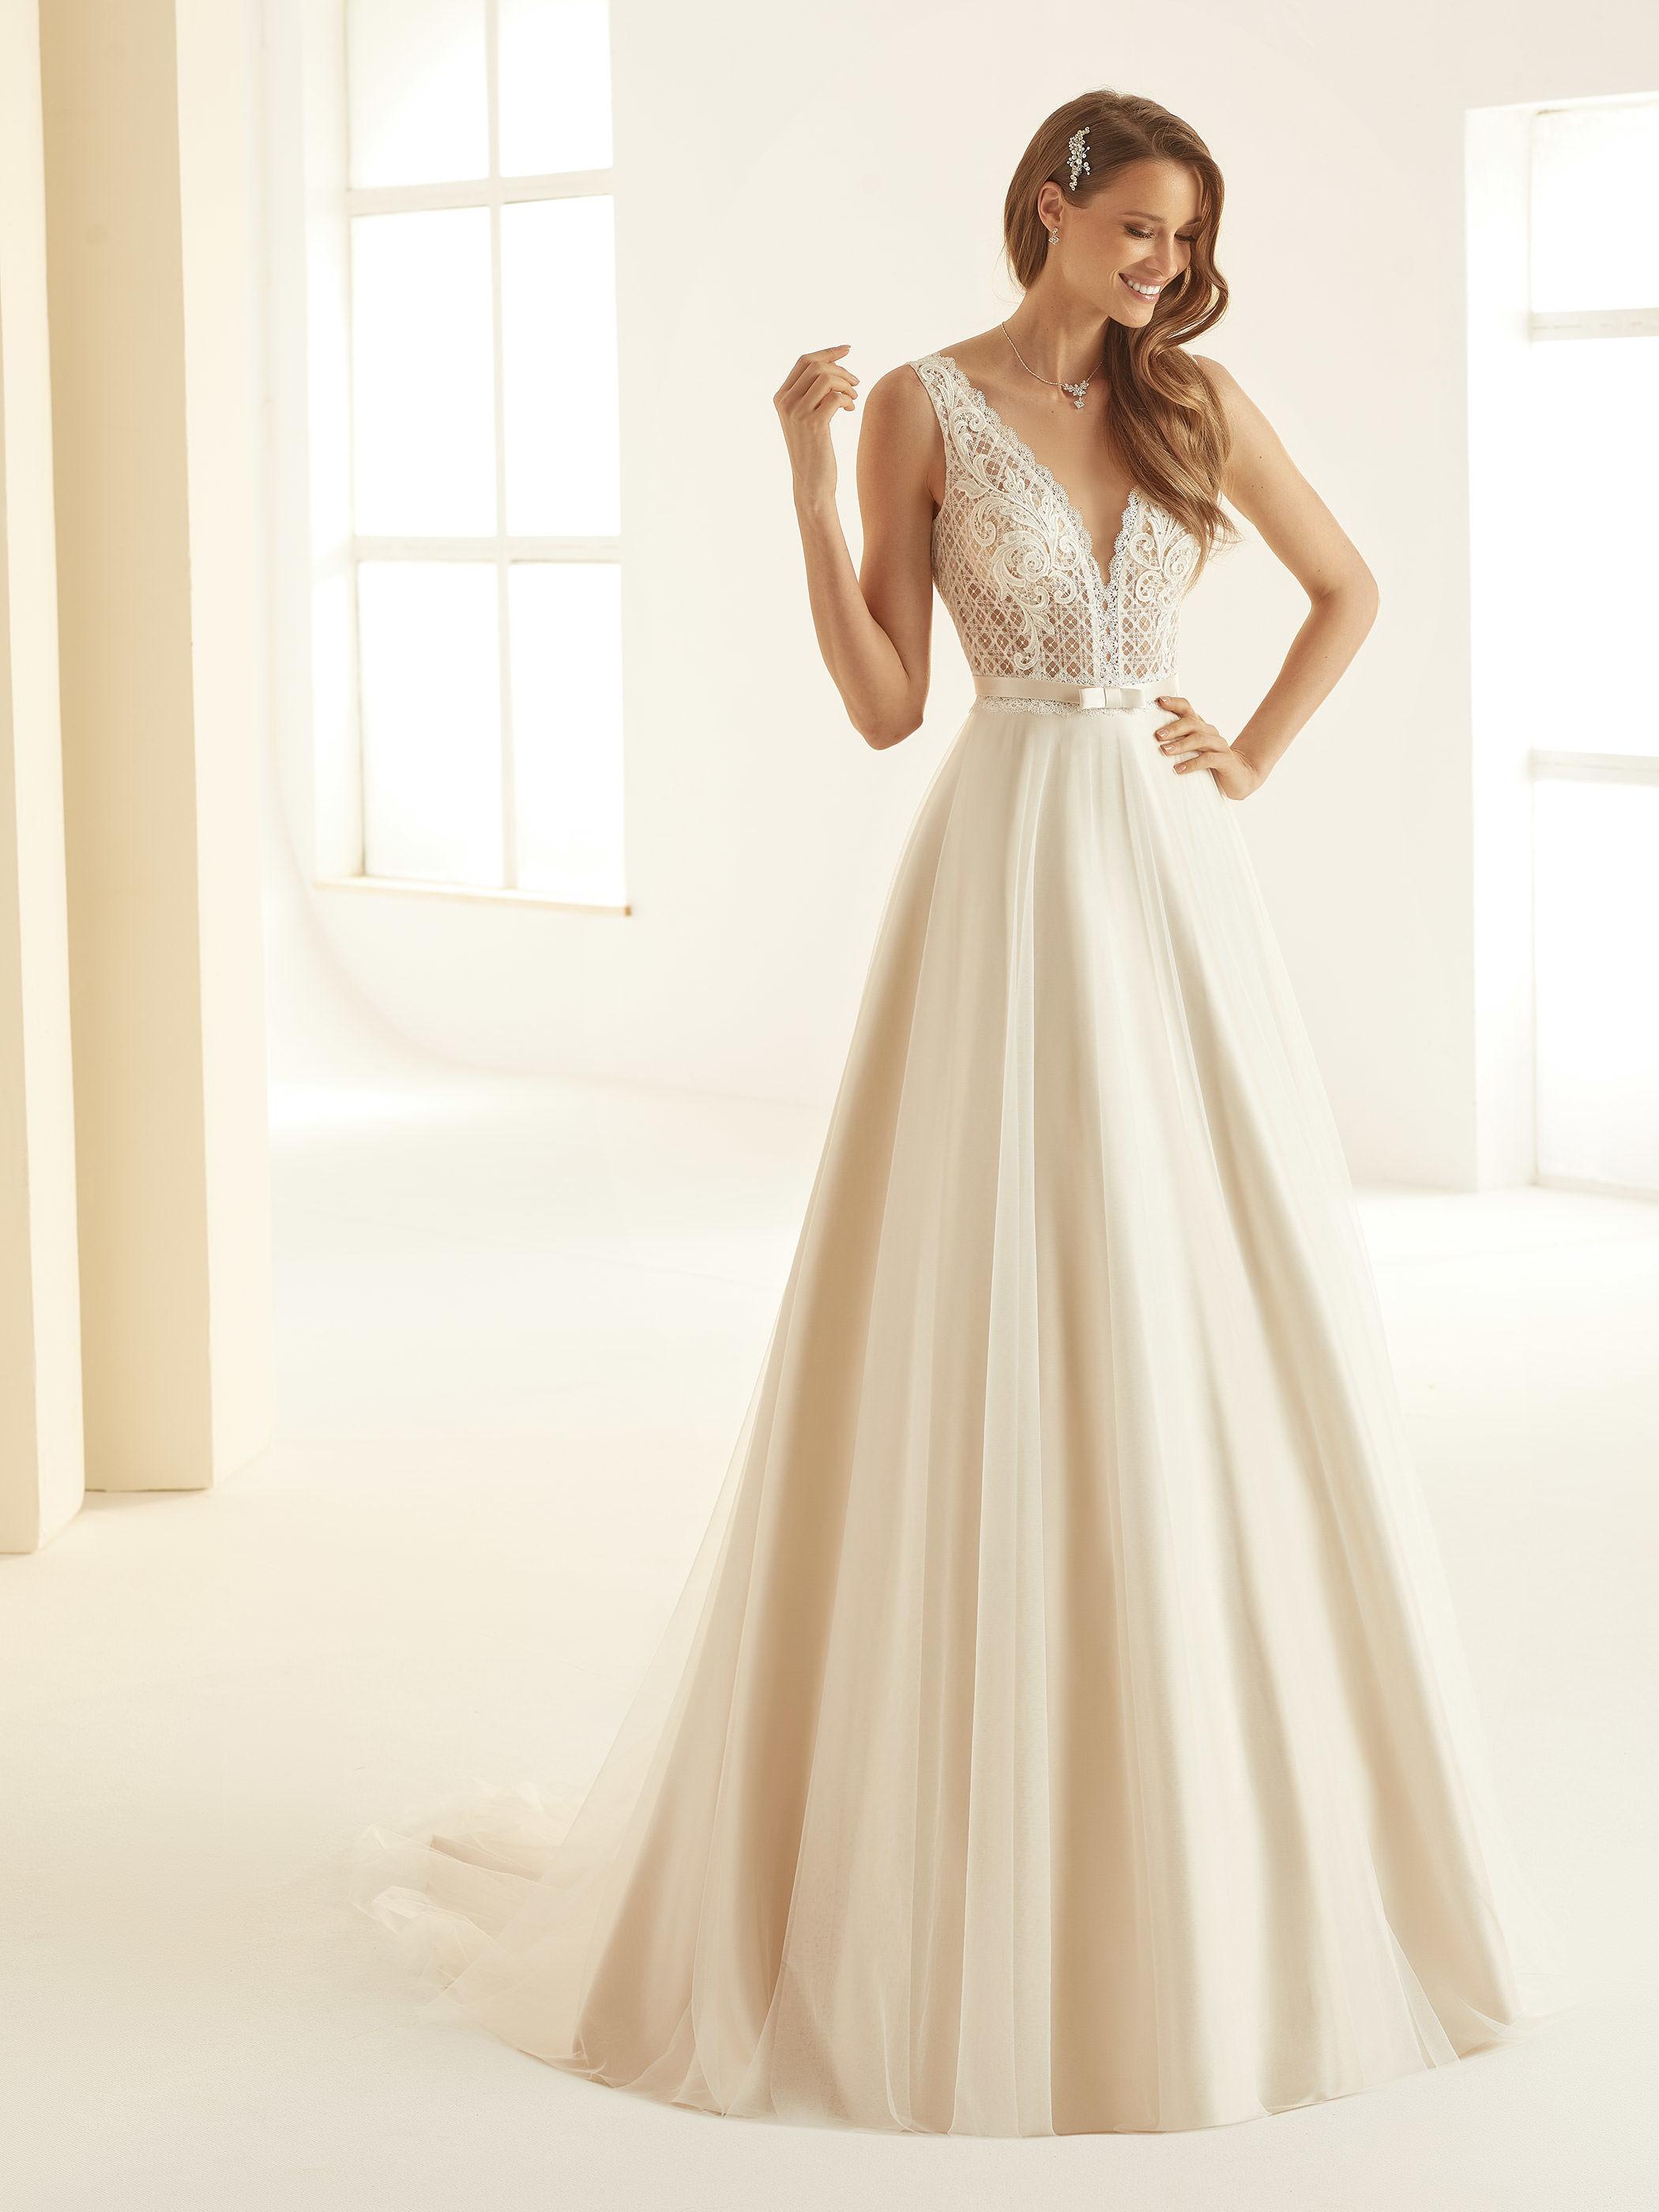 Hochzeitskleid Arcada  Samyra Fashion